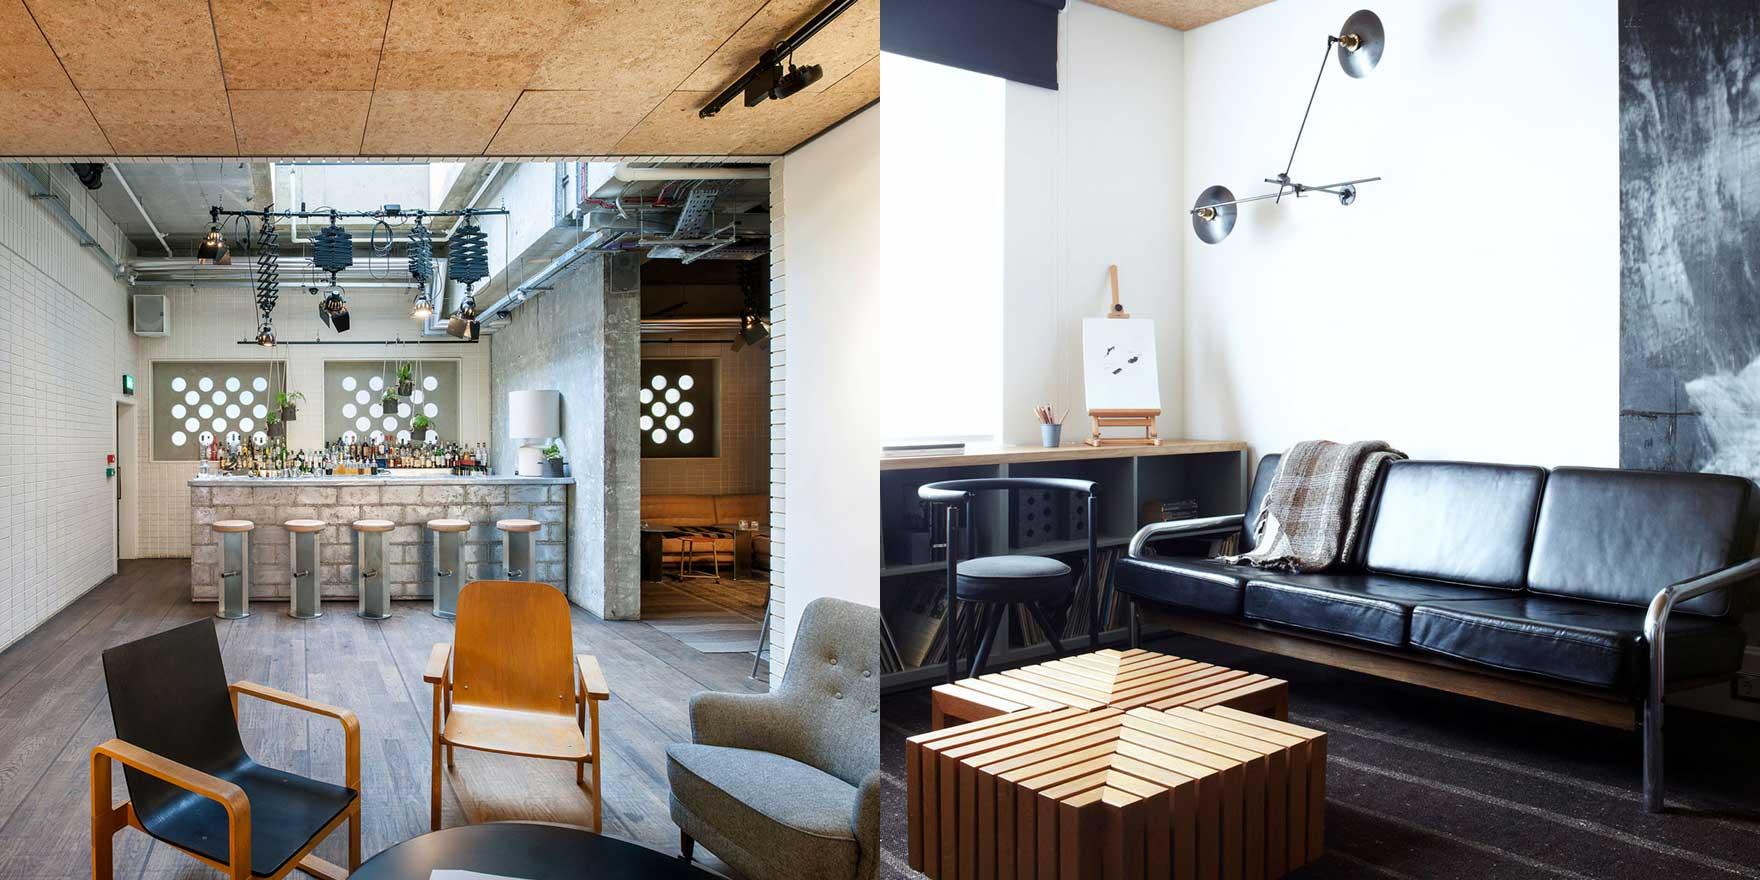 Ace Hotel London Shoreditch – Boutique Hotel in Shoreditch, London